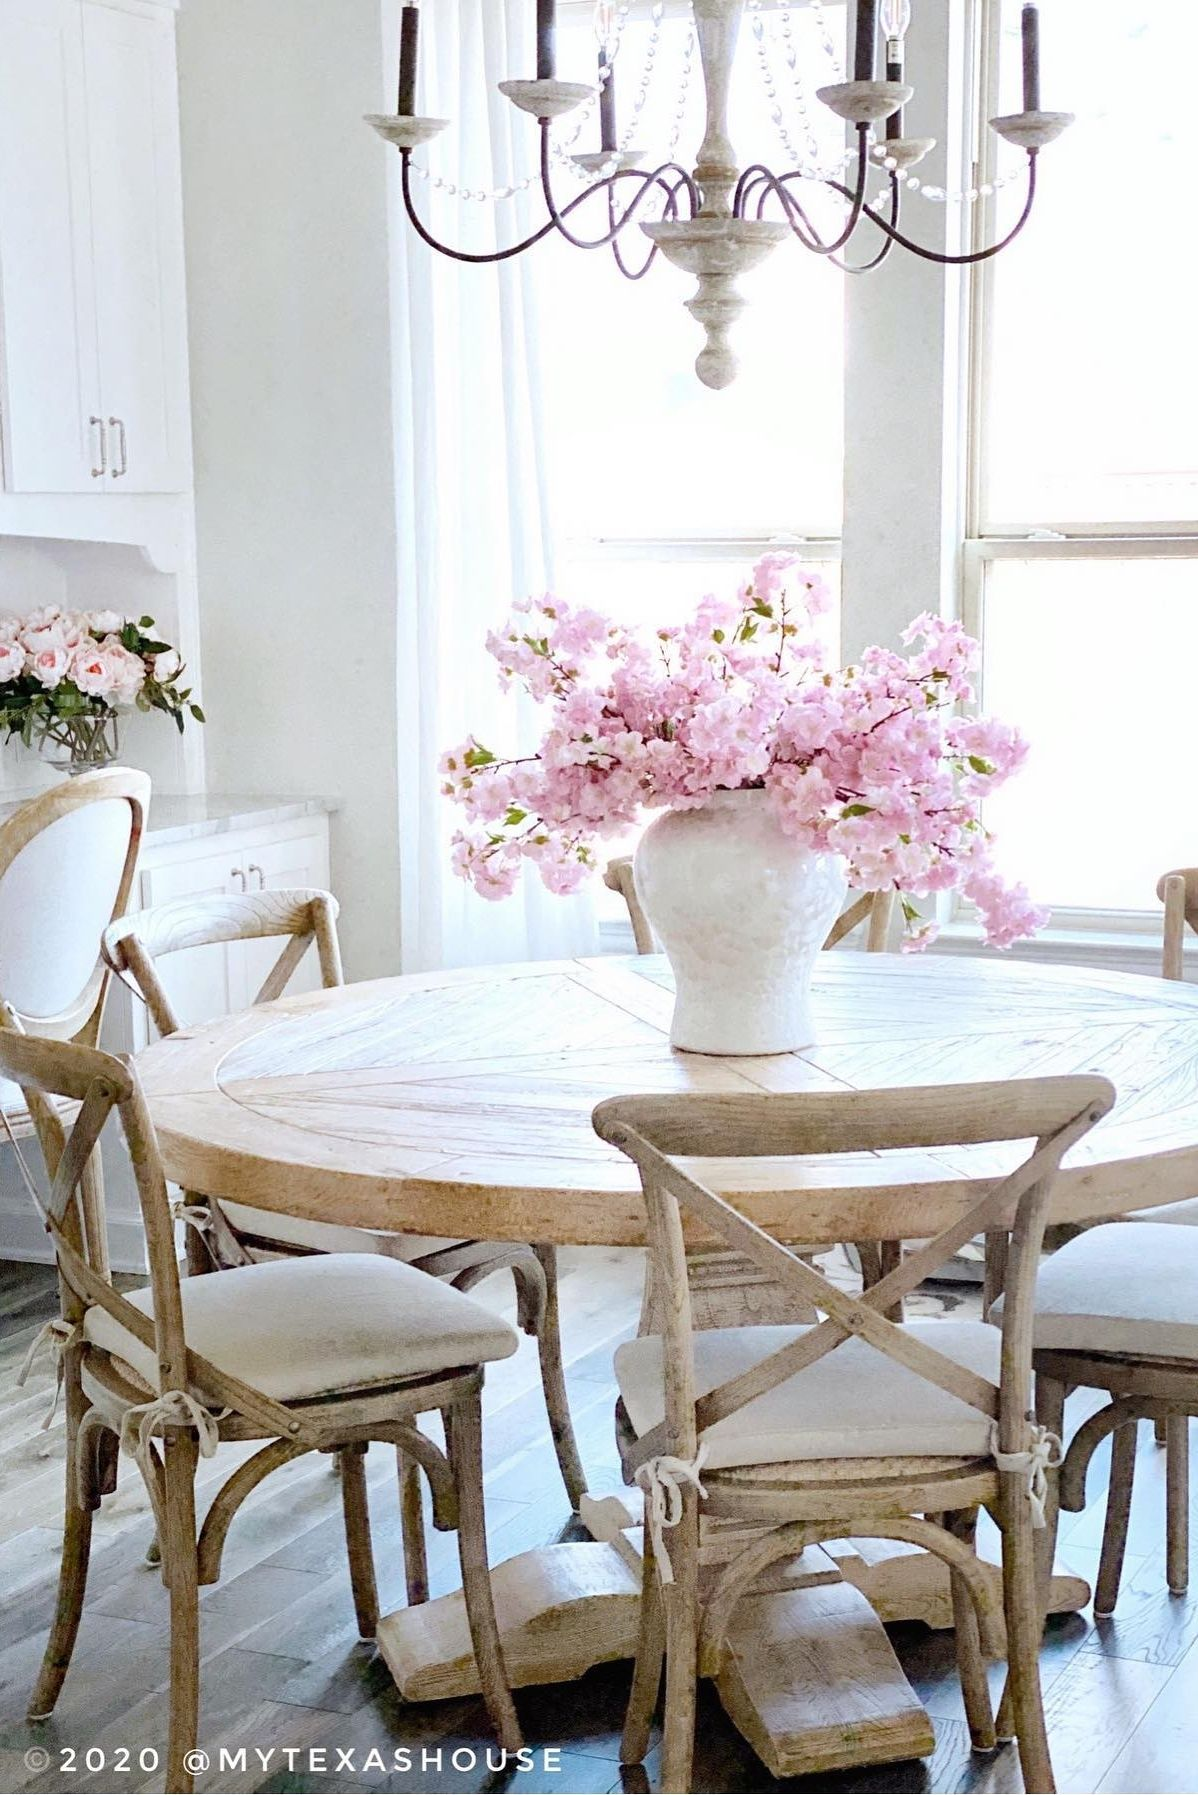 Coastal Dining Room Decor With Pink Cherry Blossoms Coastal Dining Room Decor Tulip Decor Decor